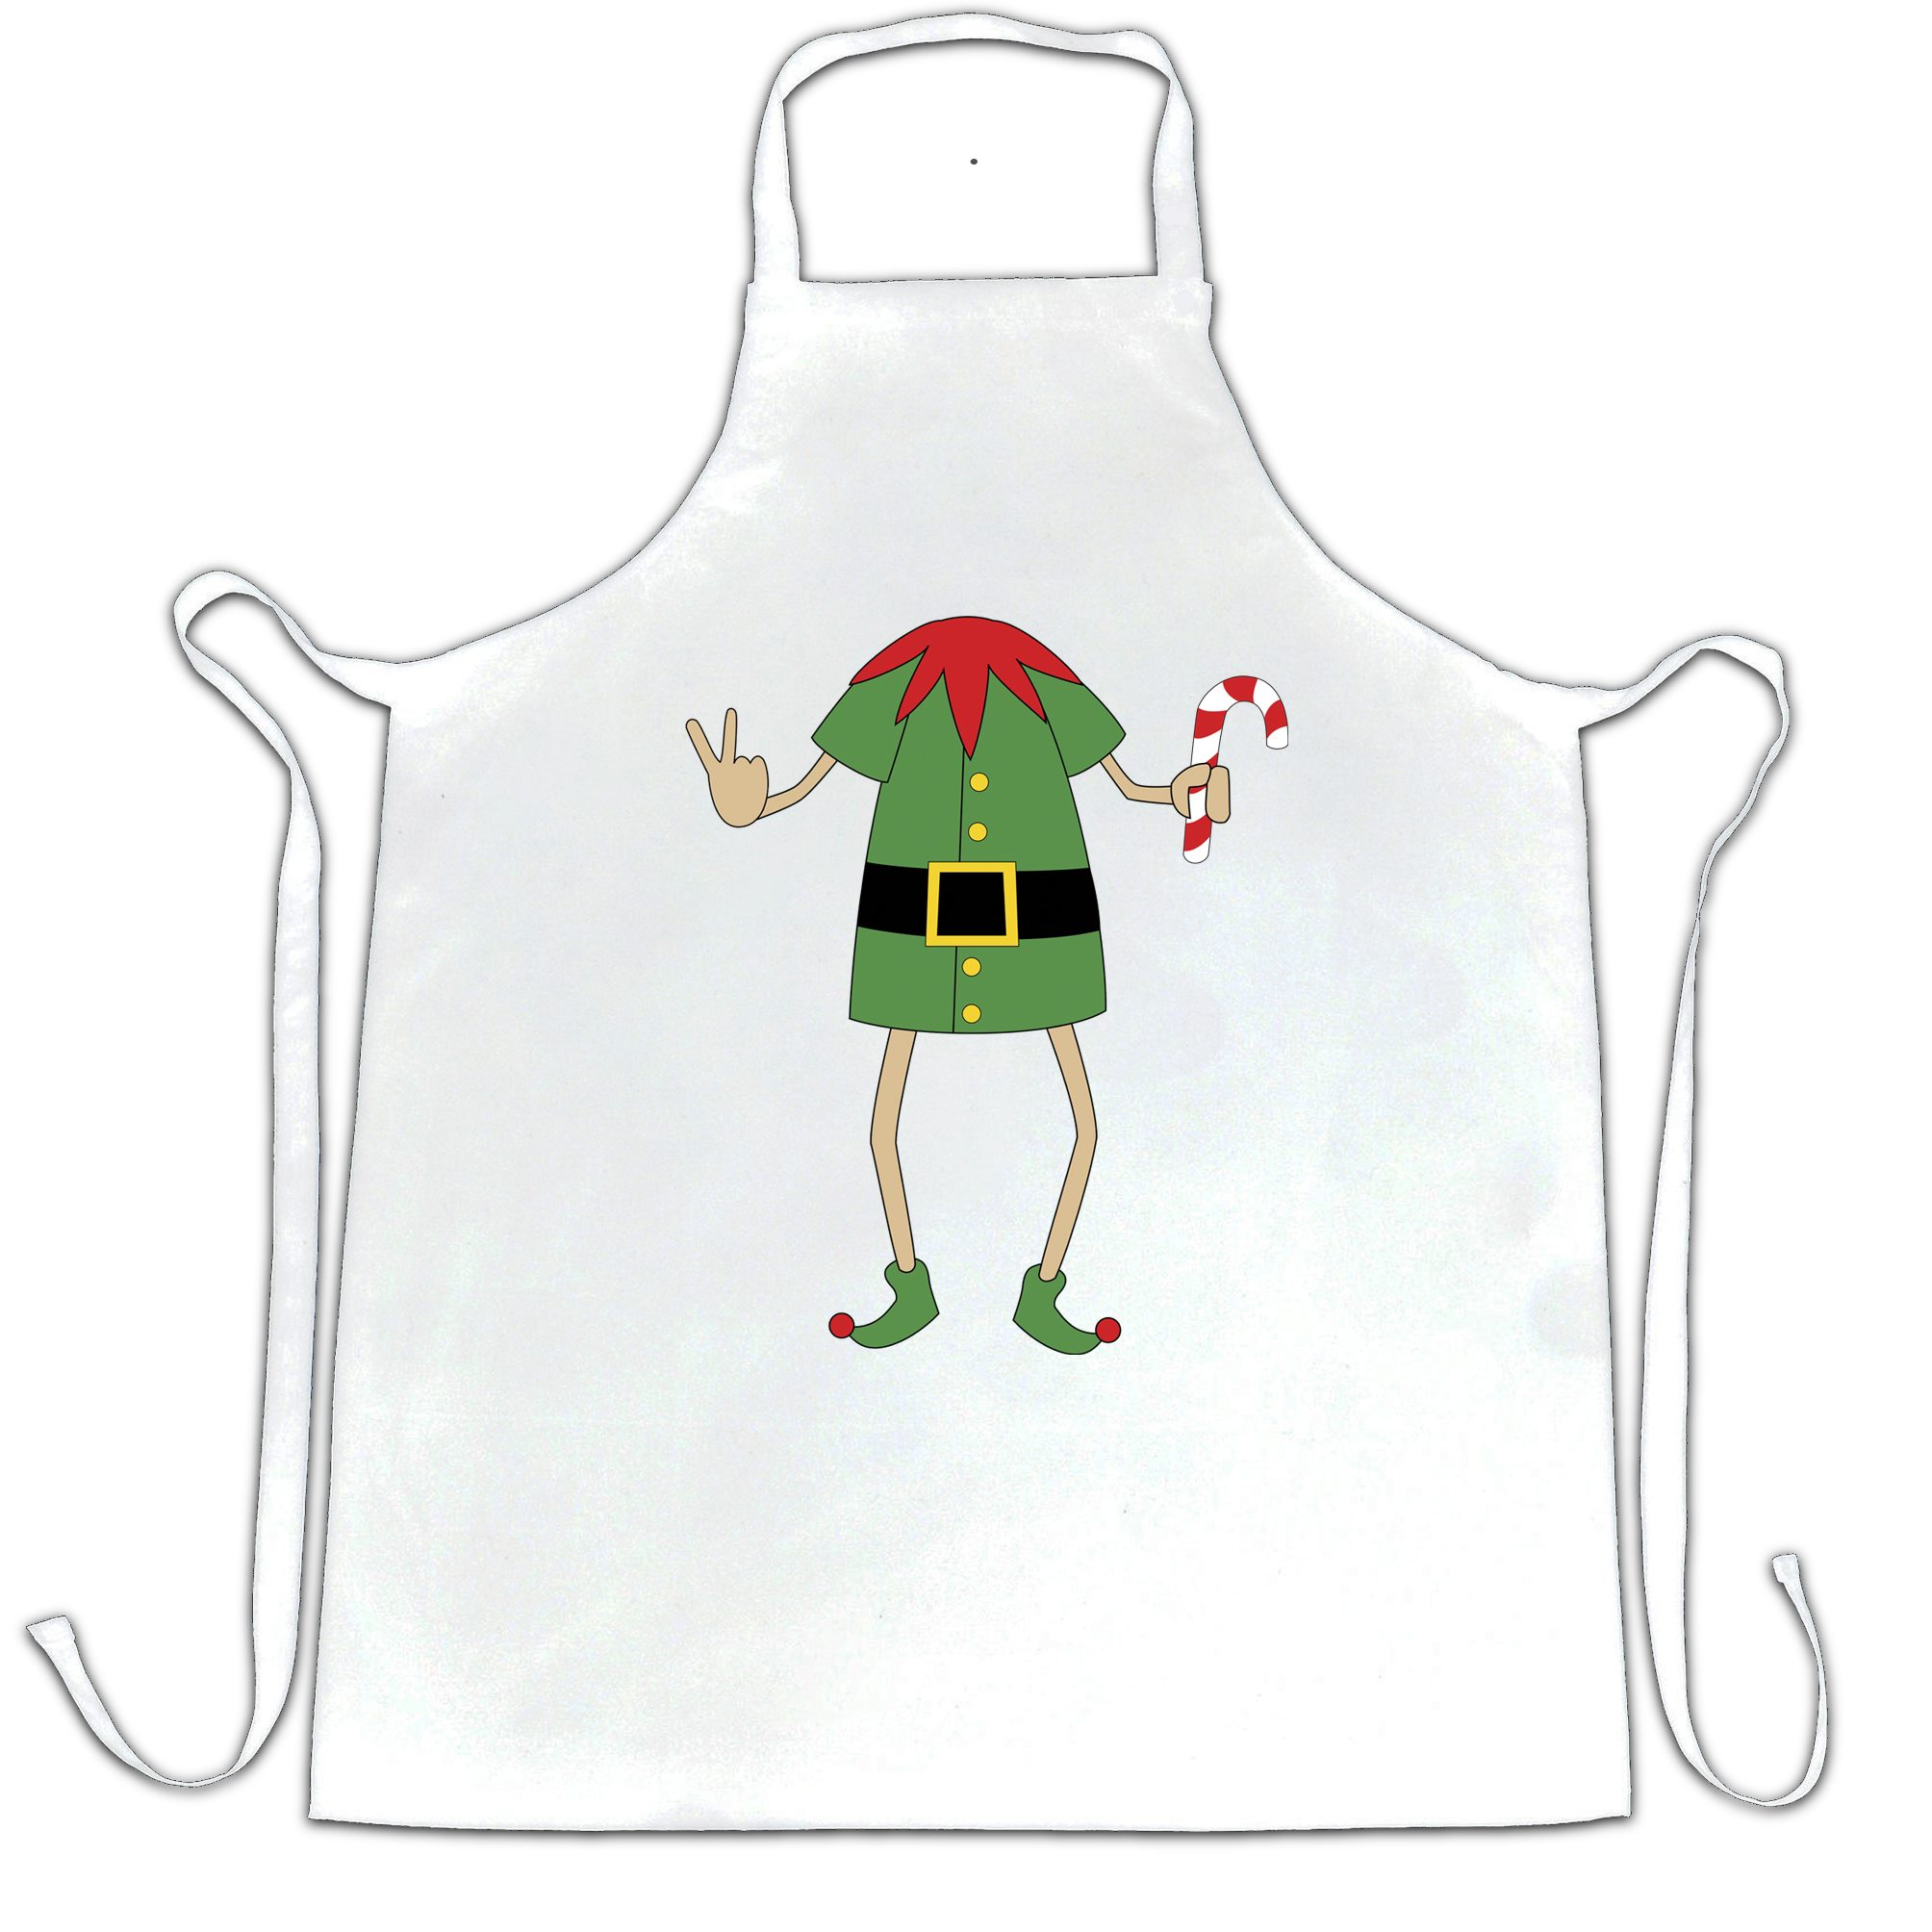 Funny Christmas Chefs Apron Rude Xmas Elf Swearing Shirtbox